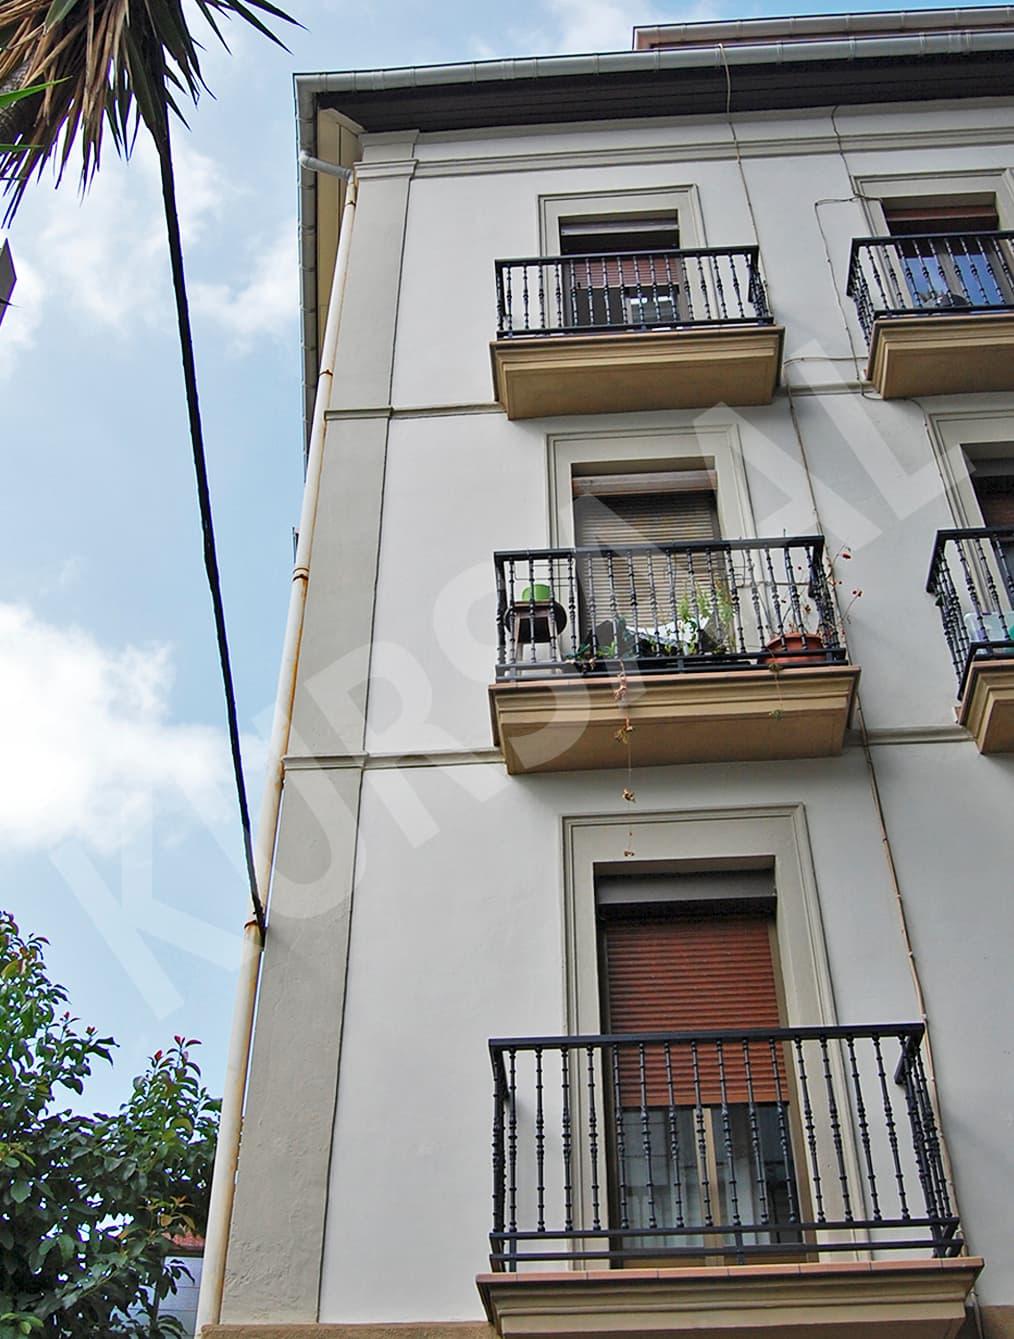 foto 8 - Restauración y patrimonio-Huertas, 4-DONOSTIA, GIPUZKOA